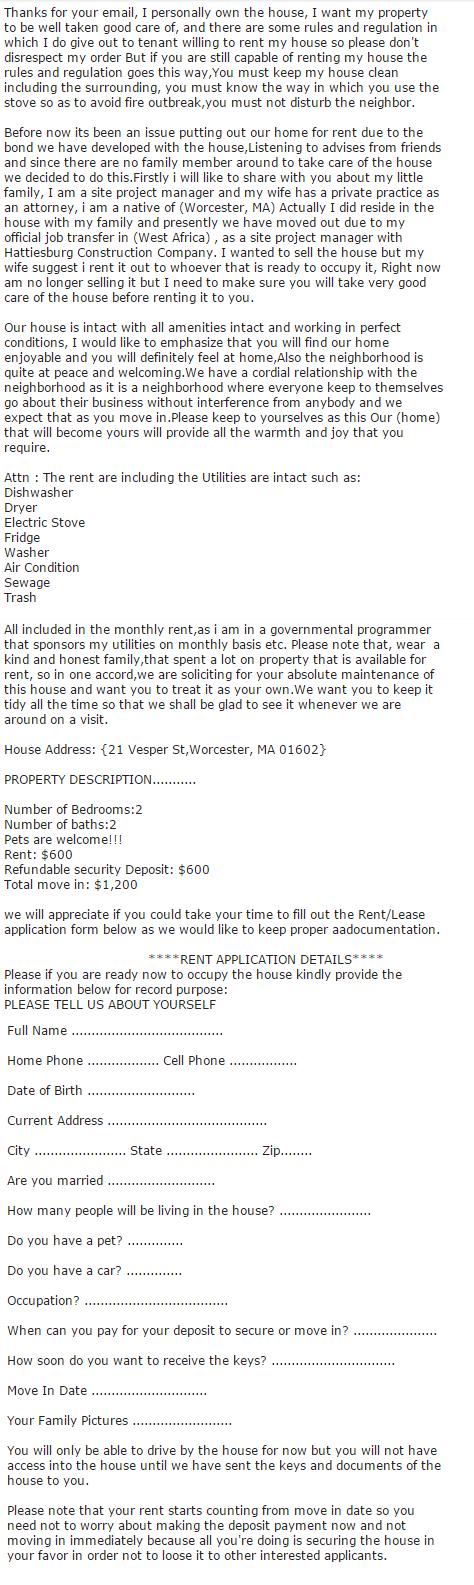 New Craigslist Apartment Rental Scam - MassLandlords.net